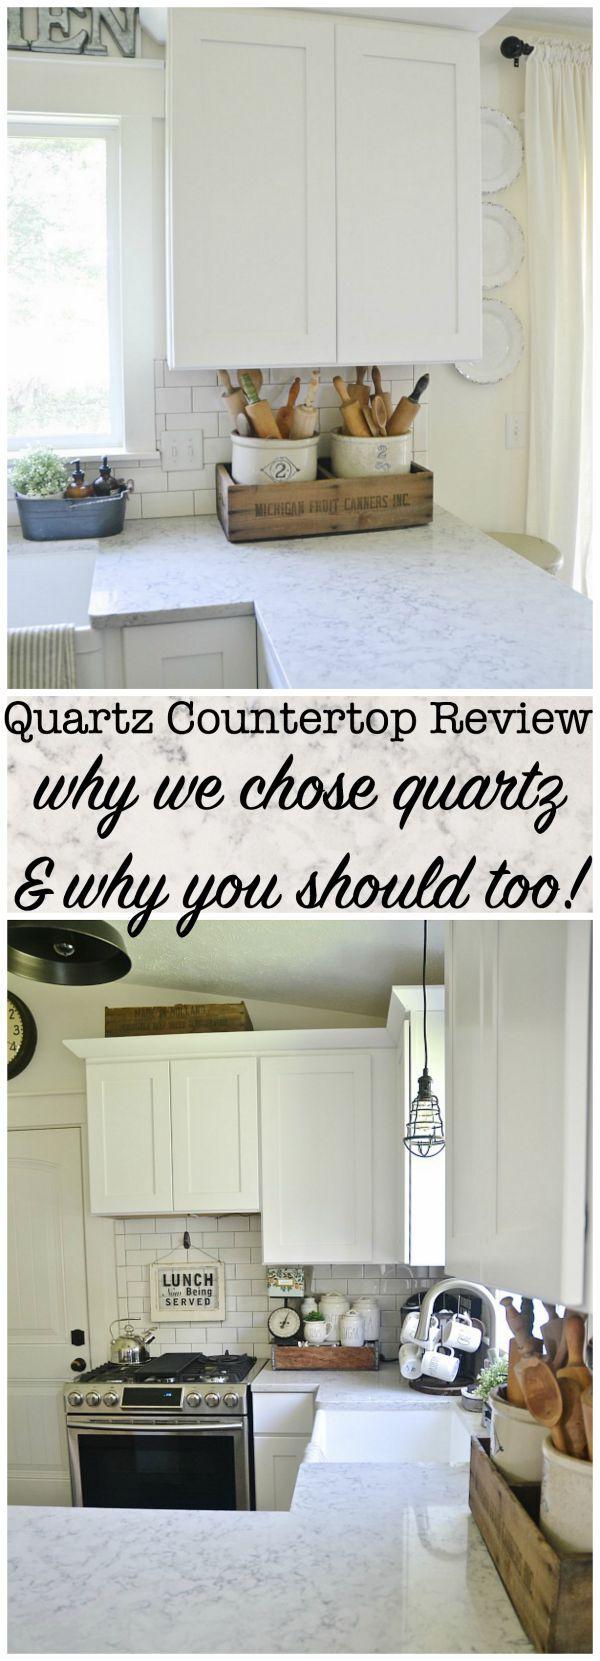 quartz countertop review pros cons liz marie bloglovin. Black Bedroom Furniture Sets. Home Design Ideas